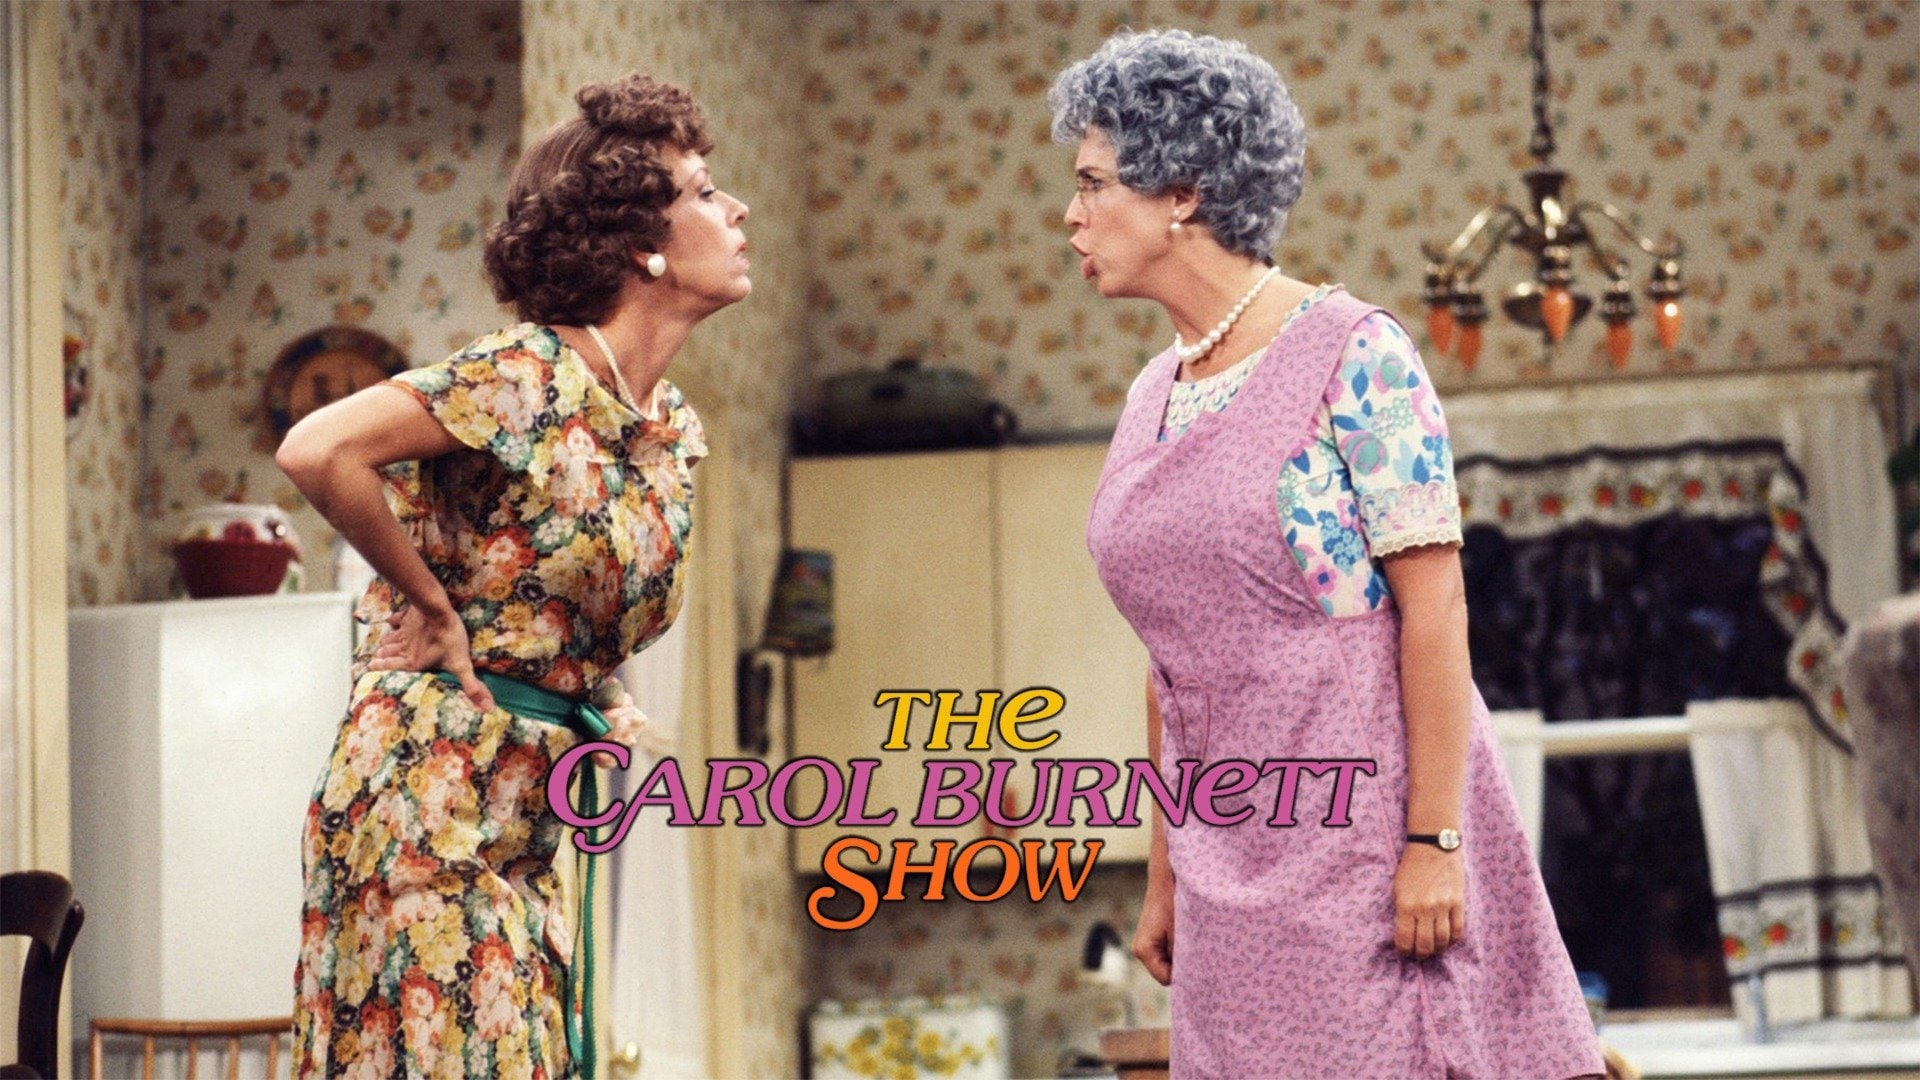 The Carol Burnett Show: Andy Griffith (Part 1)